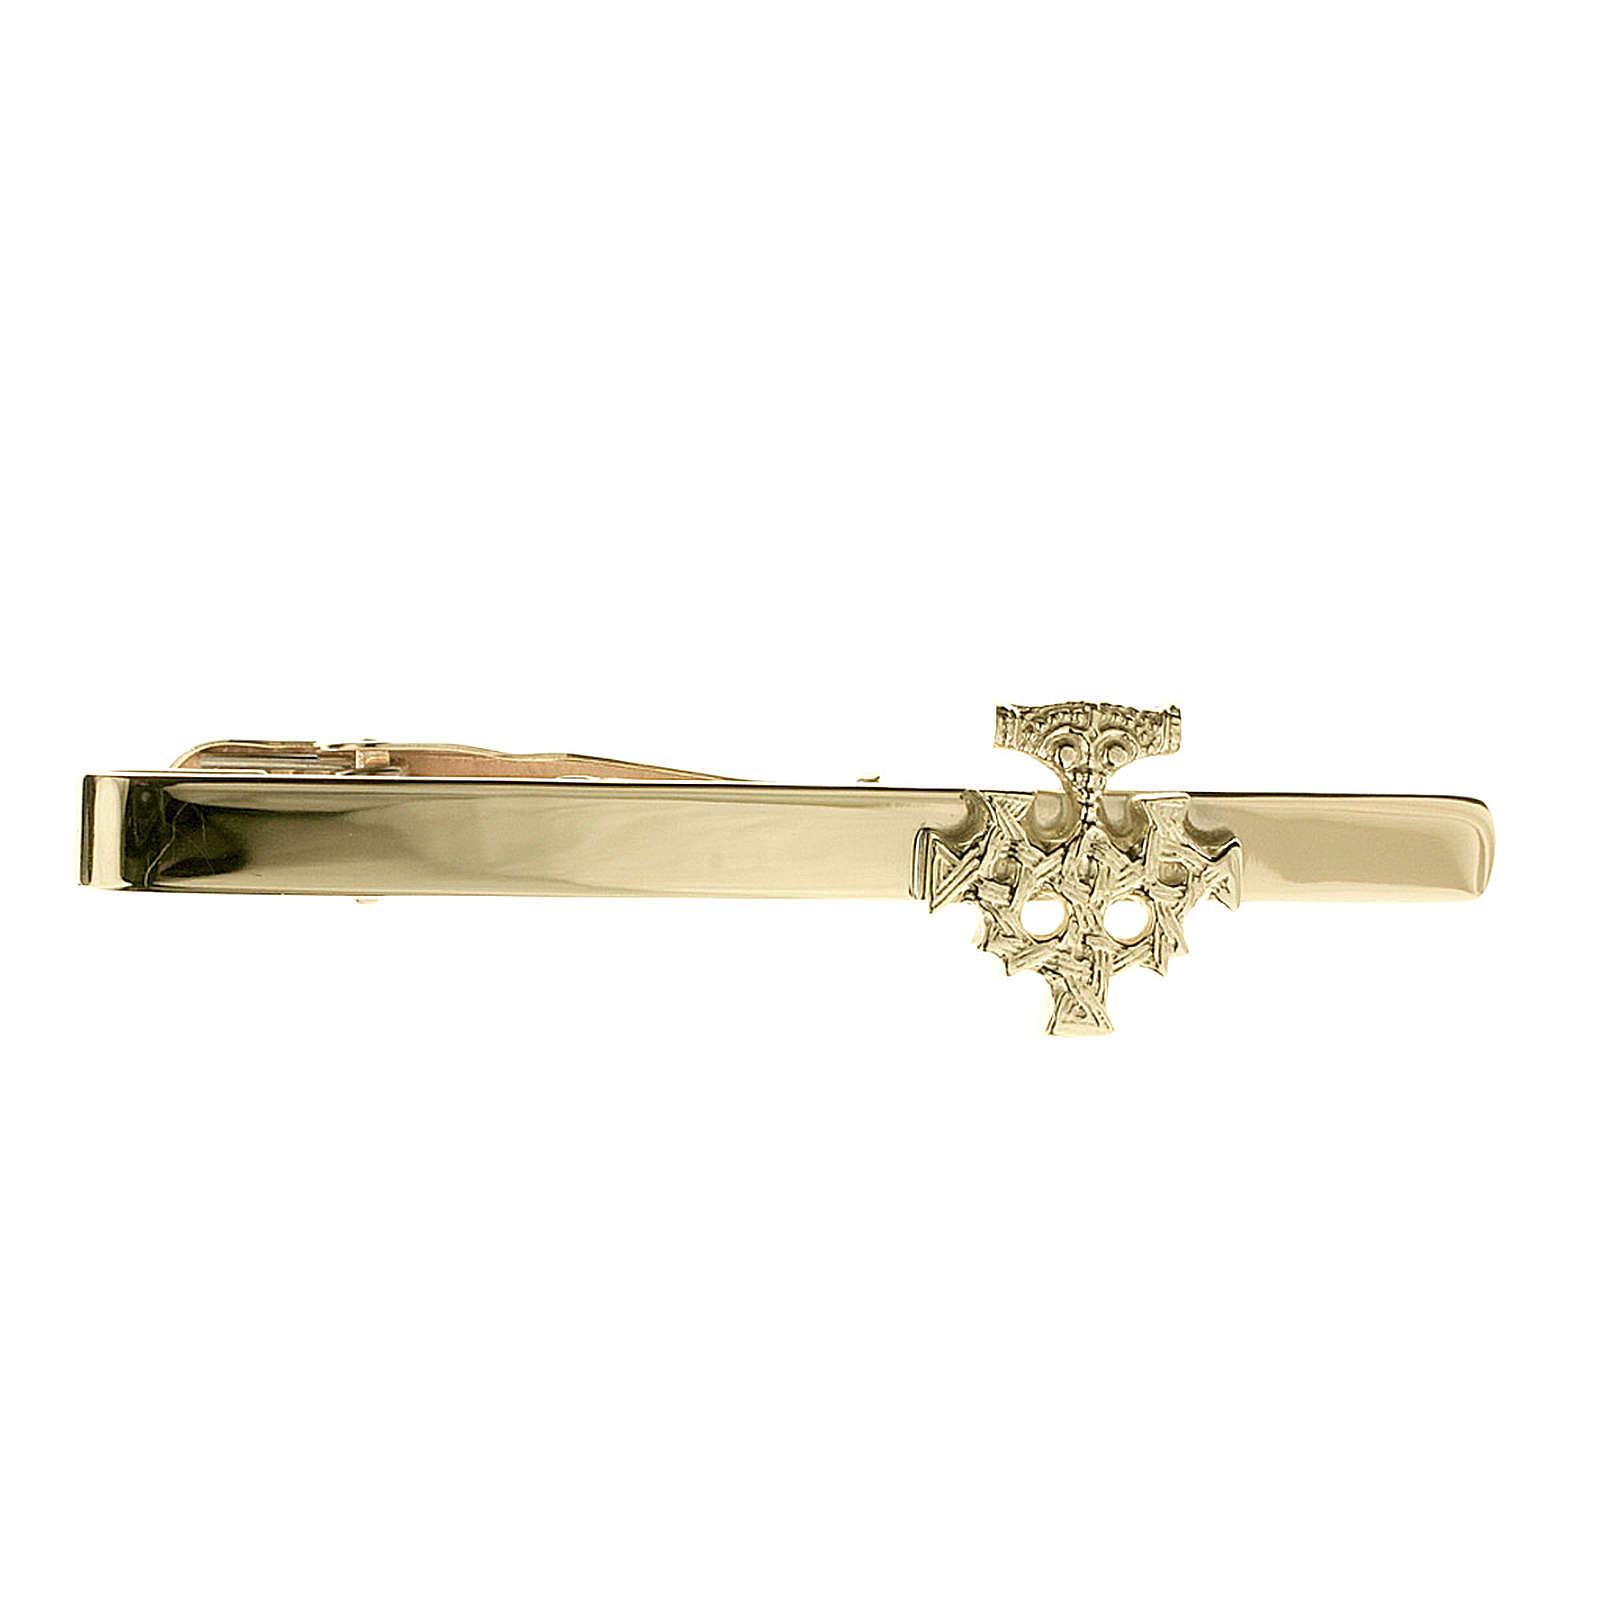 OSTSEE-SCHMUCK Krawattenhalter - Hiddensee - Gold 333/000 - , Krawattennadeln gelbgold Herren